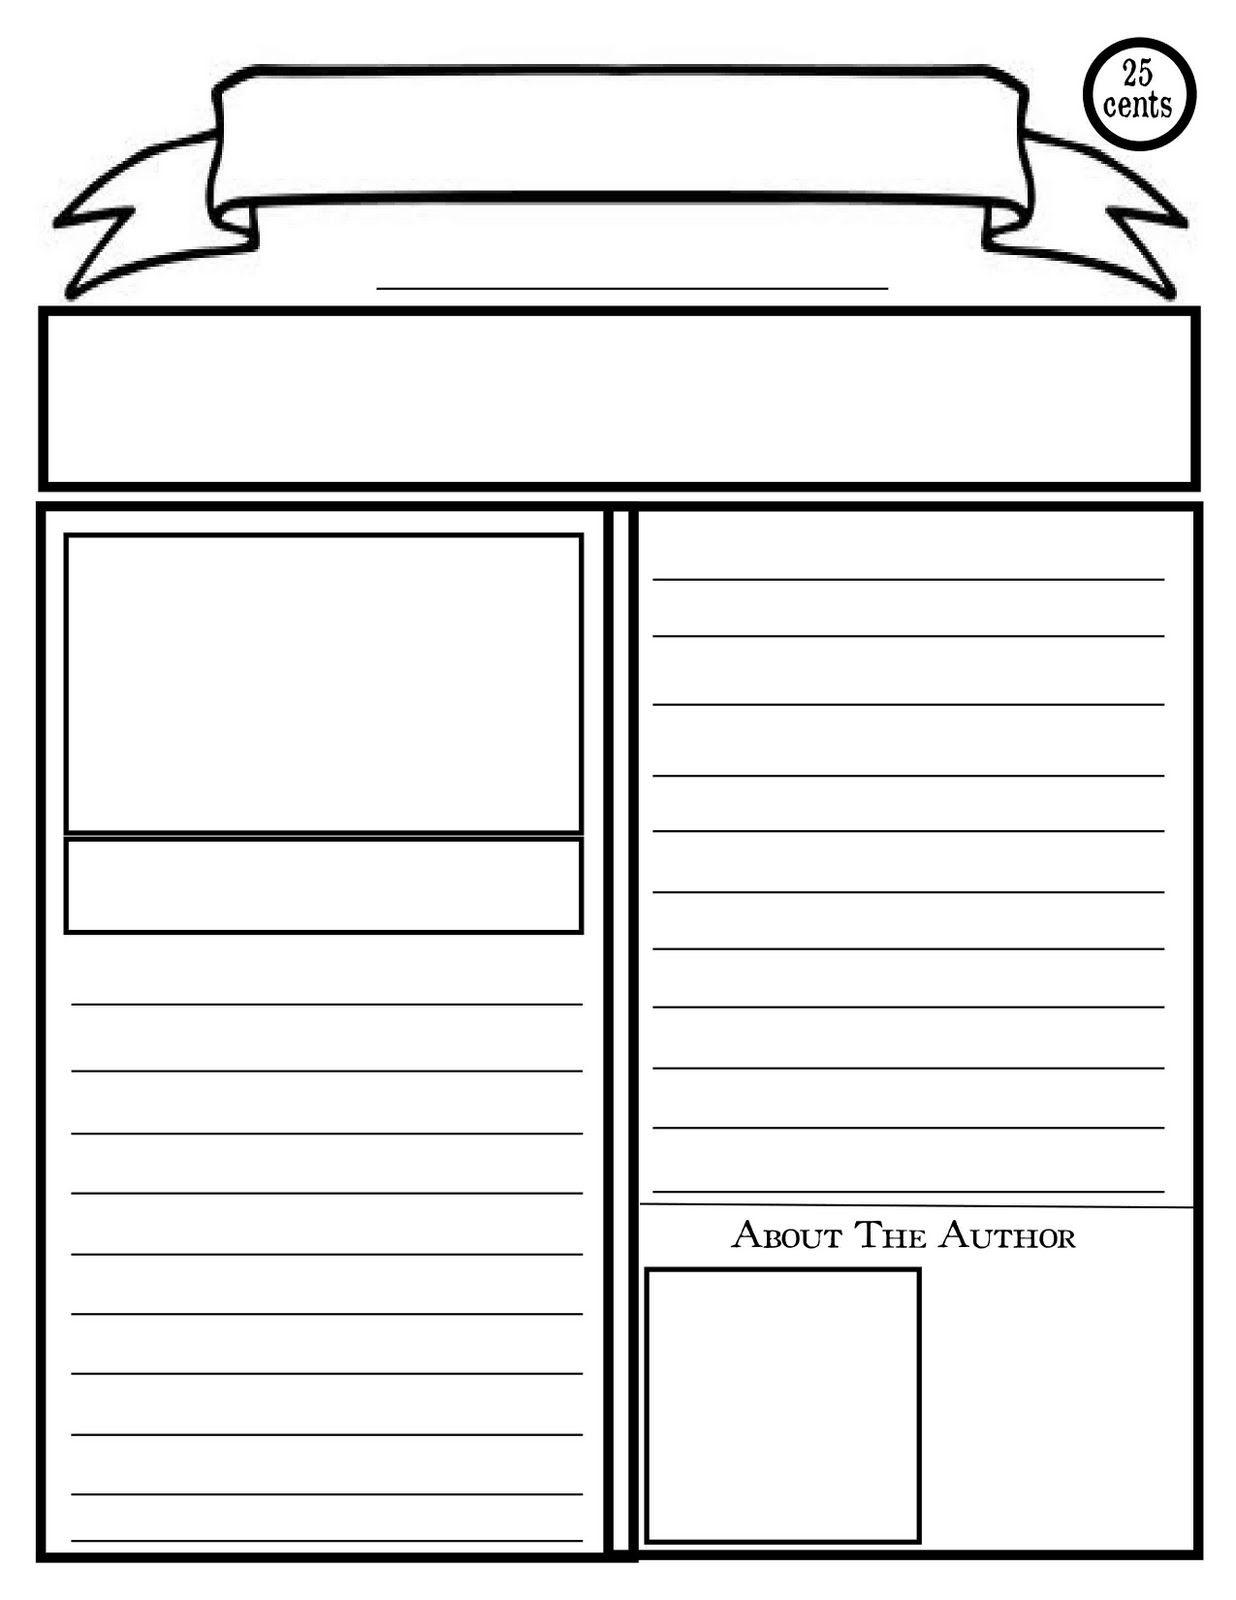 Blank Newspaper Template For Kids Printable | Homework Help - Free Printable Homework Templates